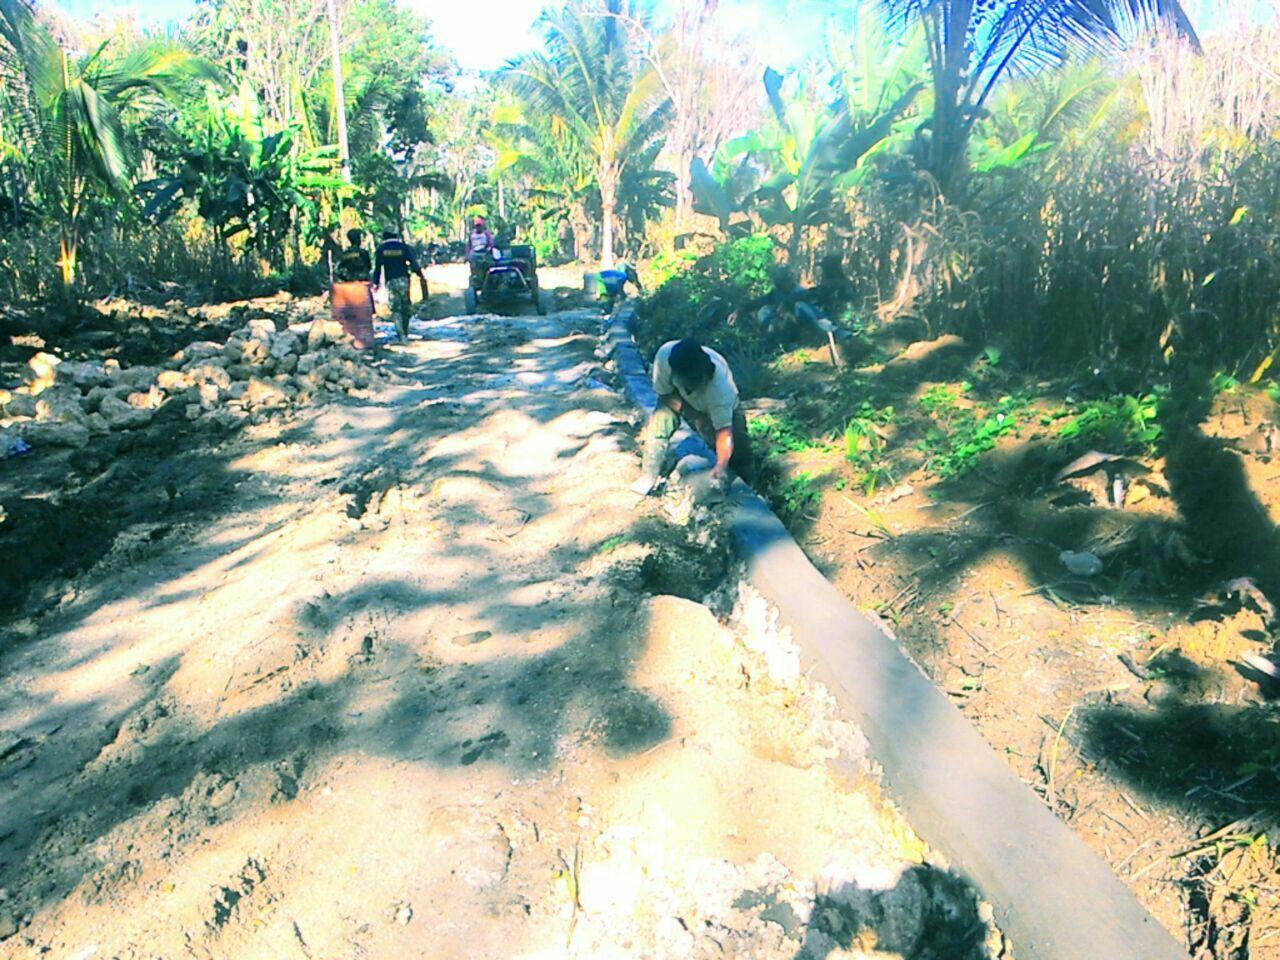 Satgas TMMD Kodim 1407/Bone Bersama Masyarakat Genjot Pembangunan Talud Jalan